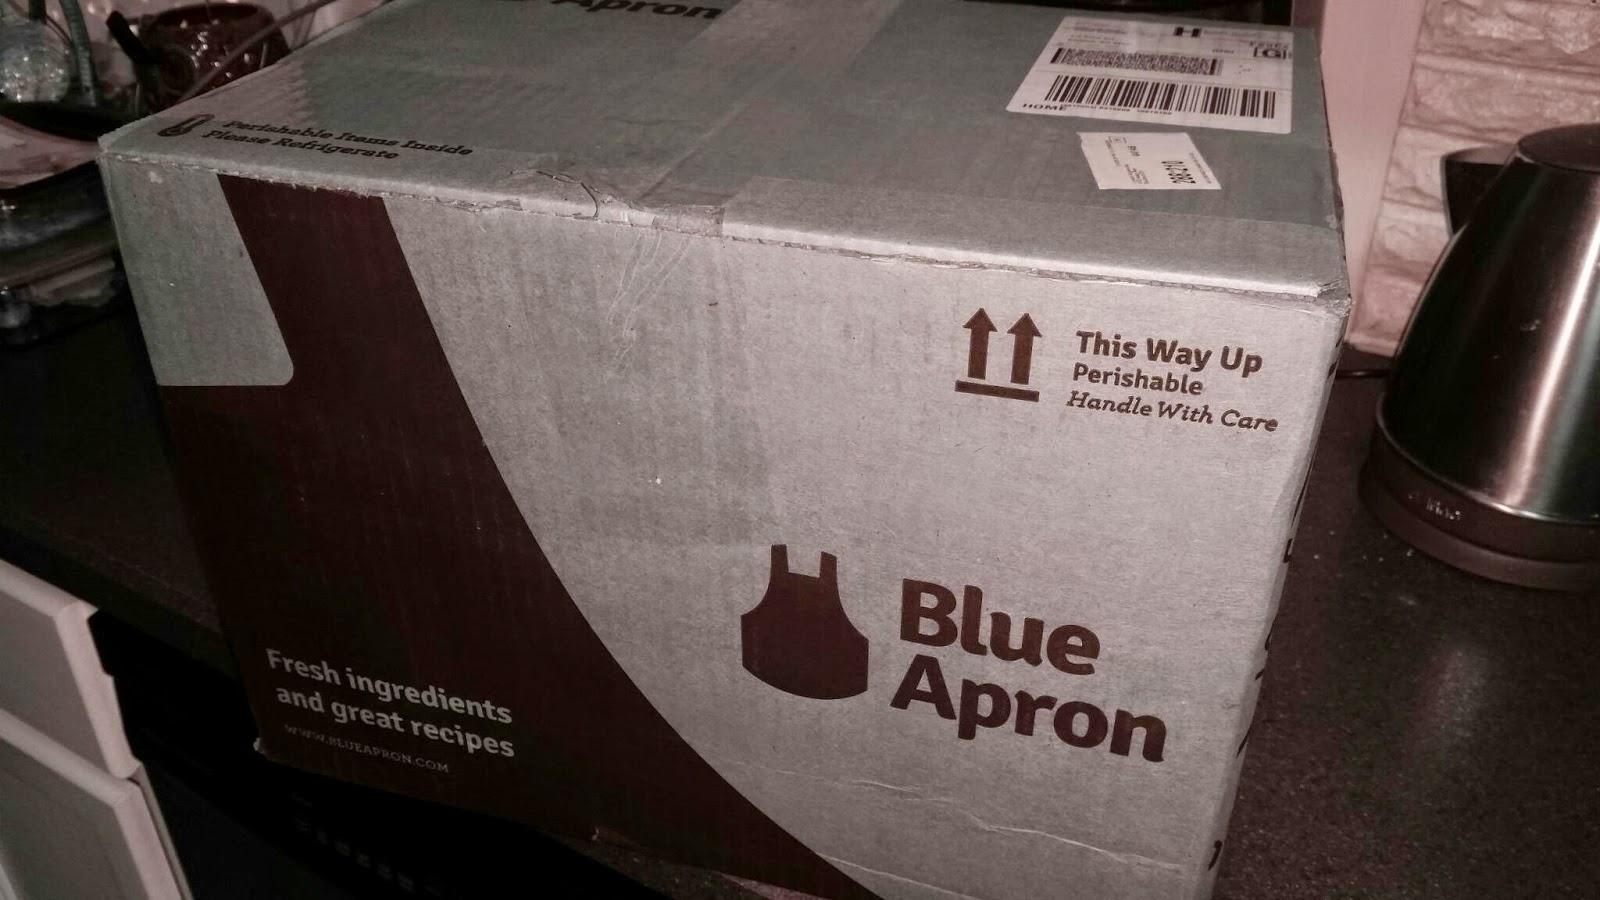 Blue apron waste - All